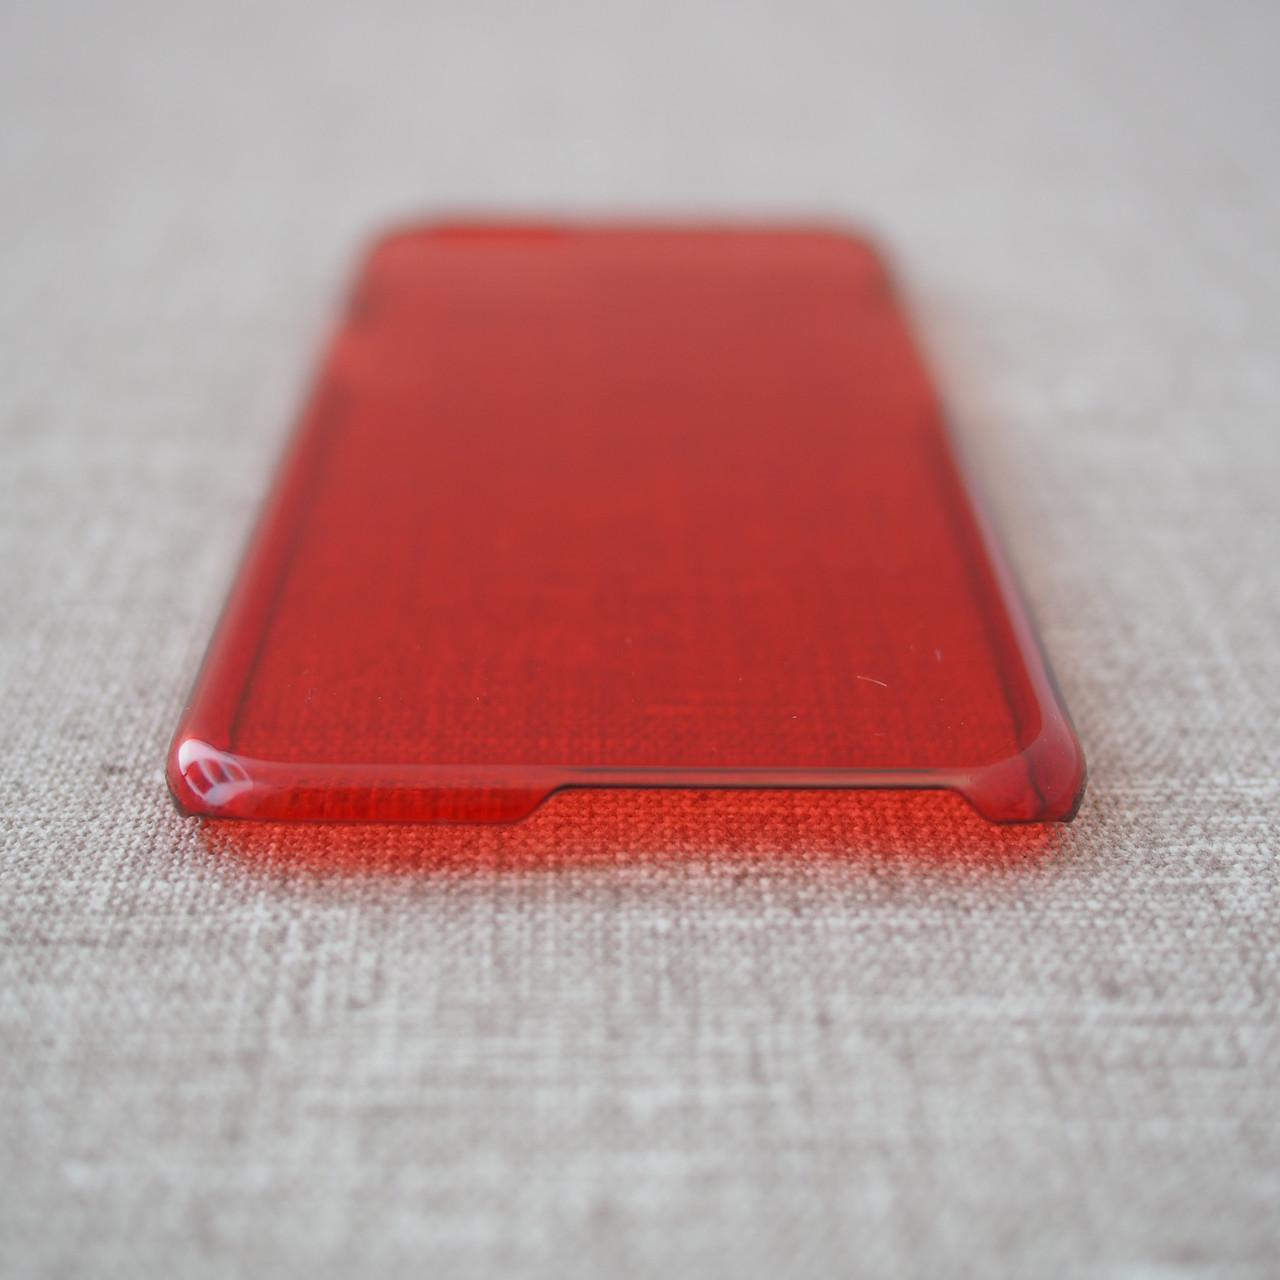 iPhone 6 red Для телефона Apple